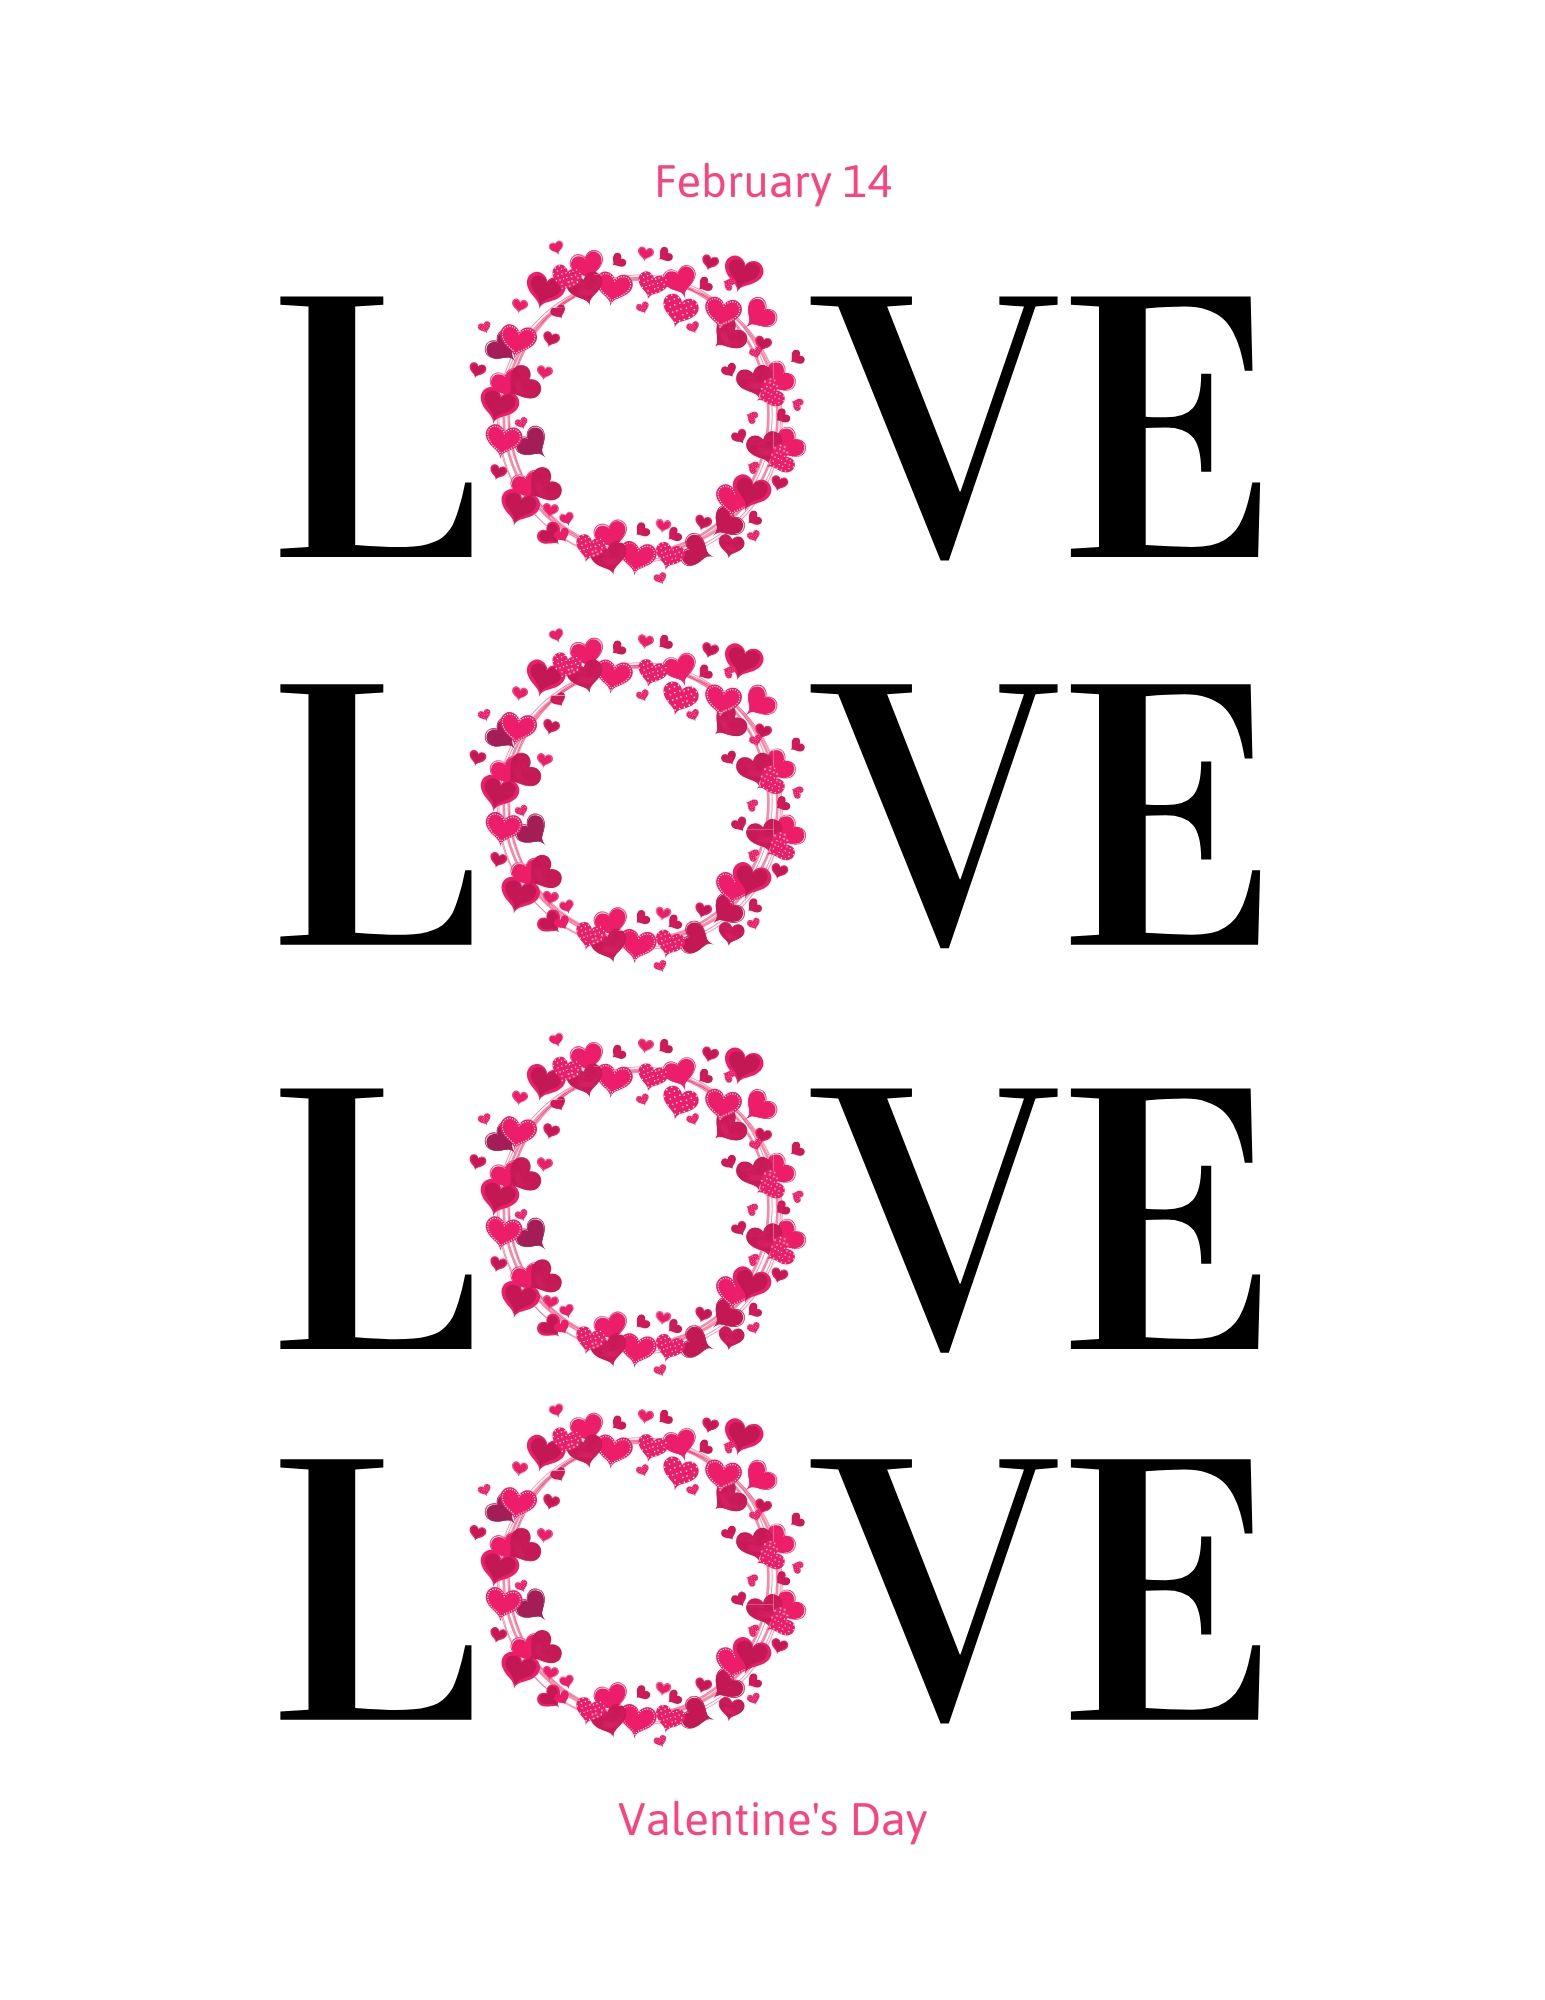 DIY Decor Love 2 #ValentinesDay #ValentineWallArt #DIY #WallArt #DIYDecor